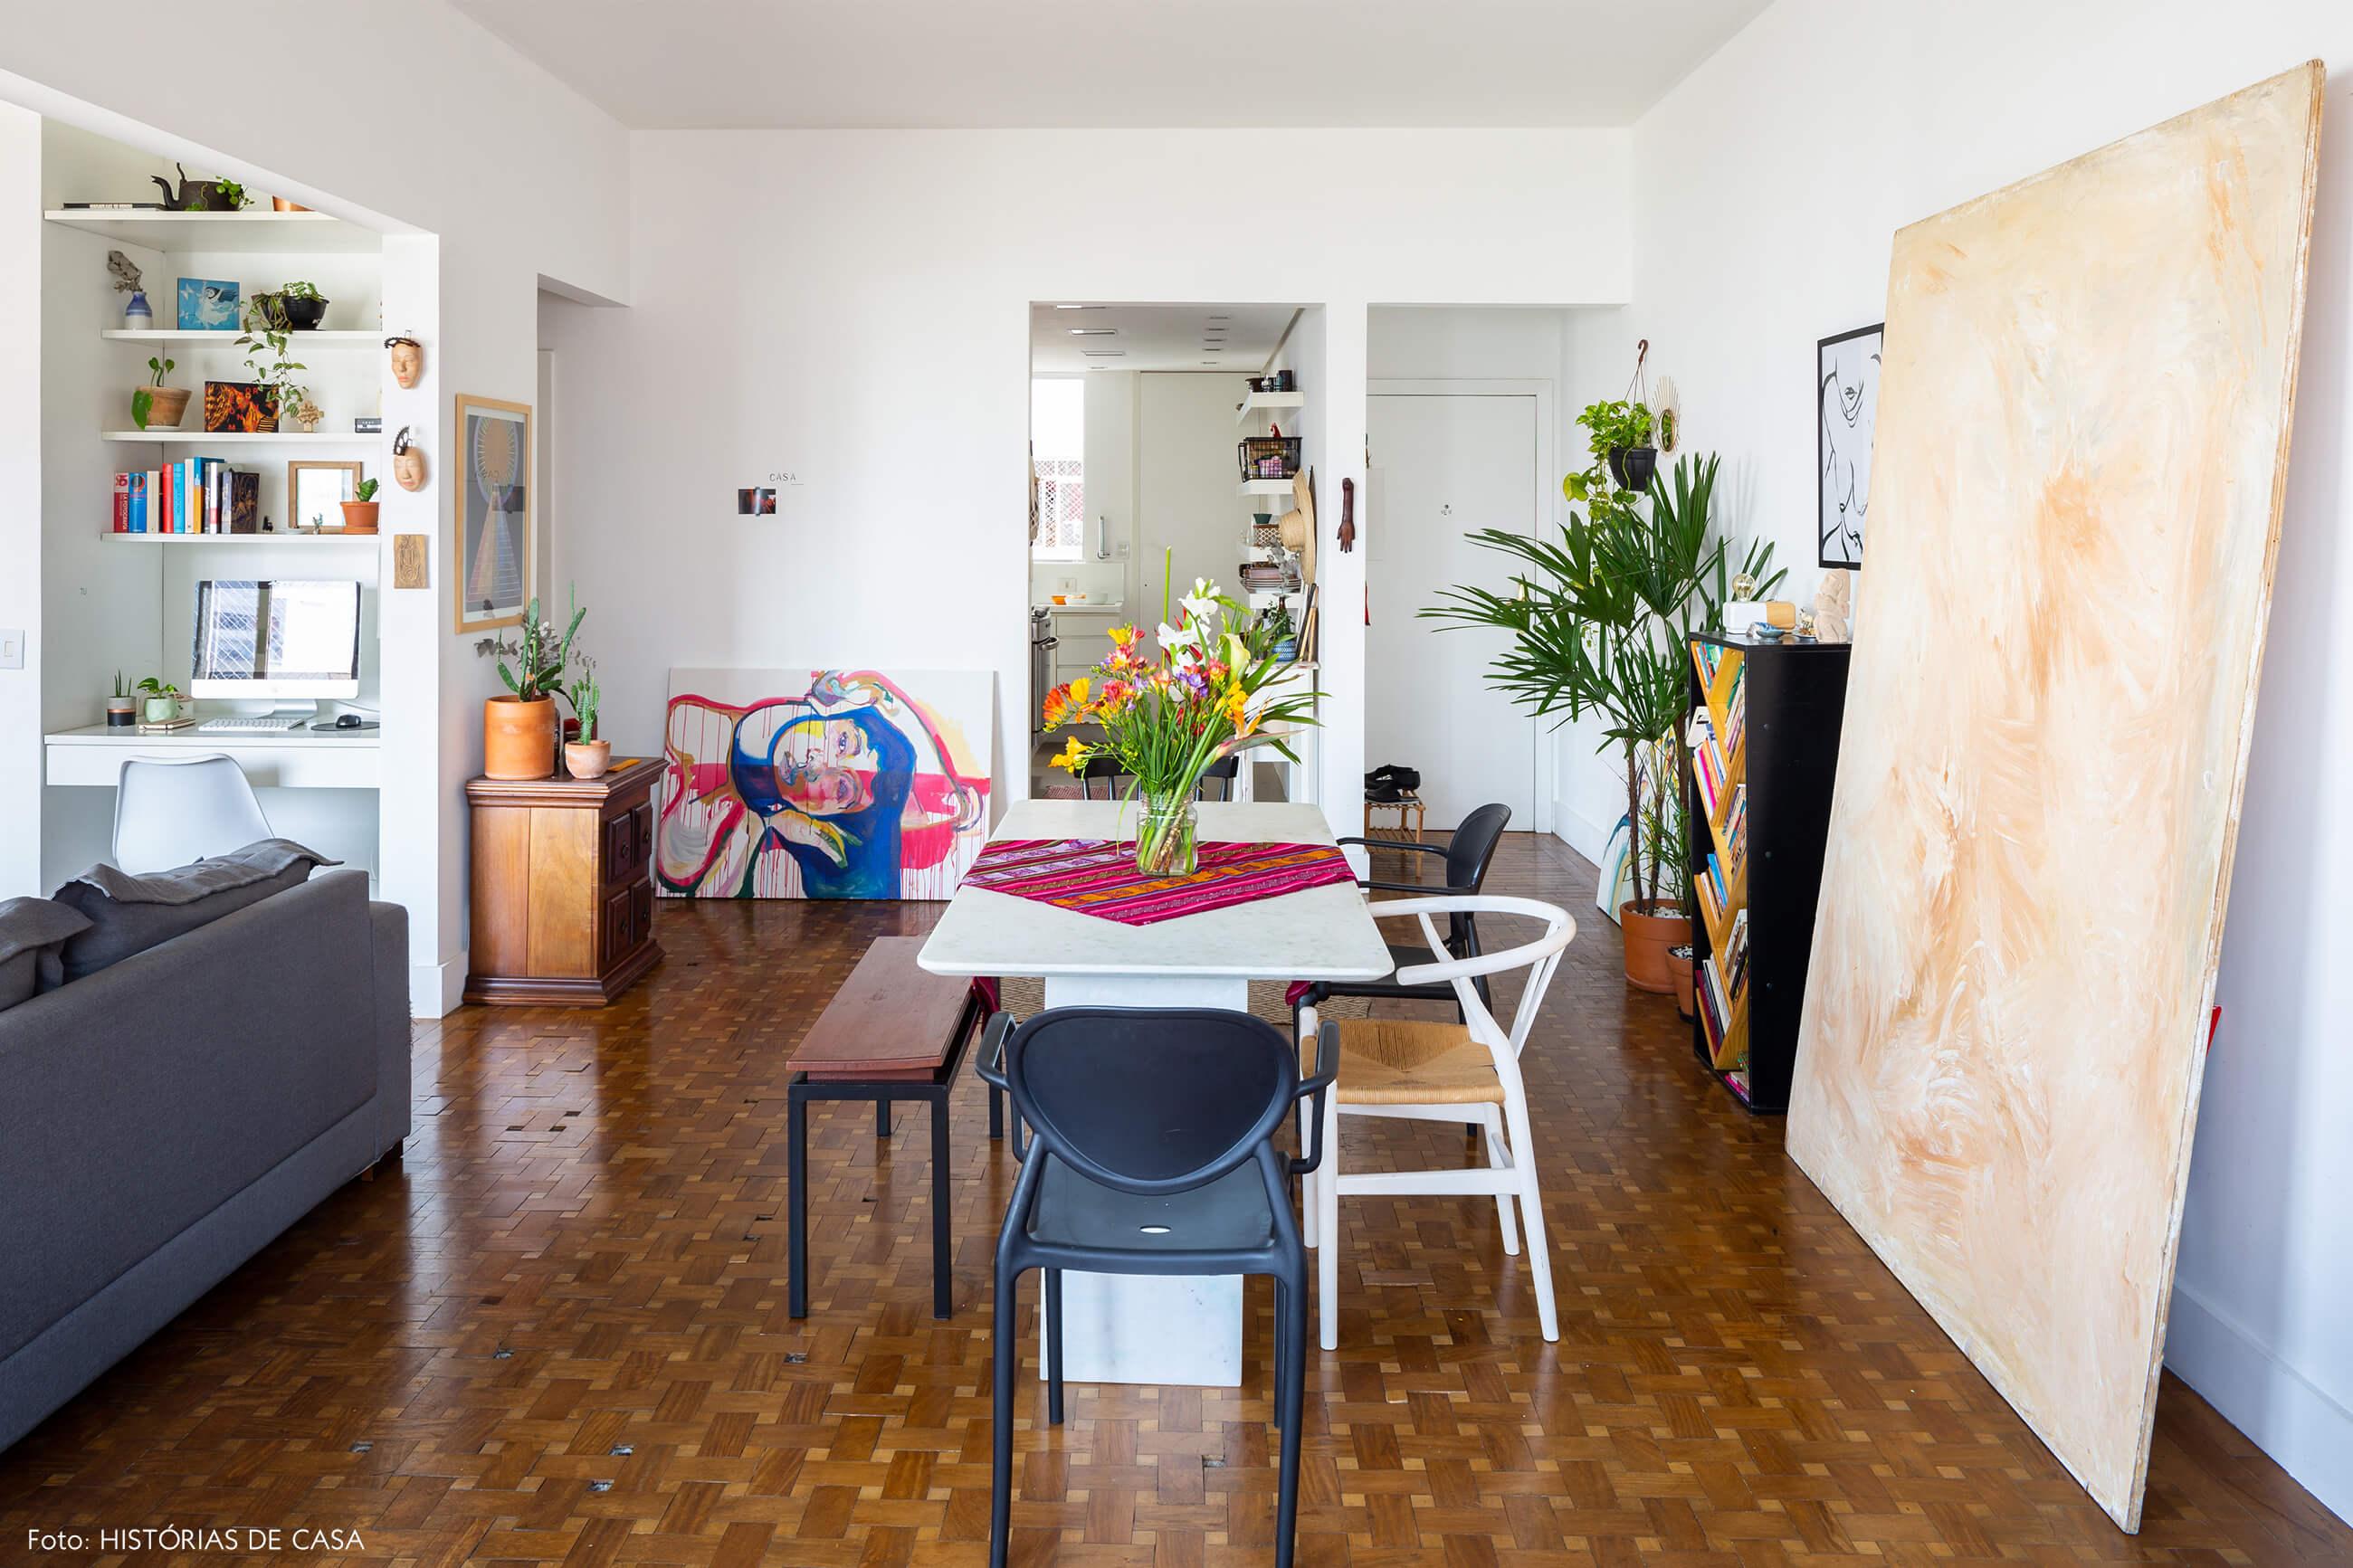 sala-jantar-com-mesa-branca-pinturas-e-plantas